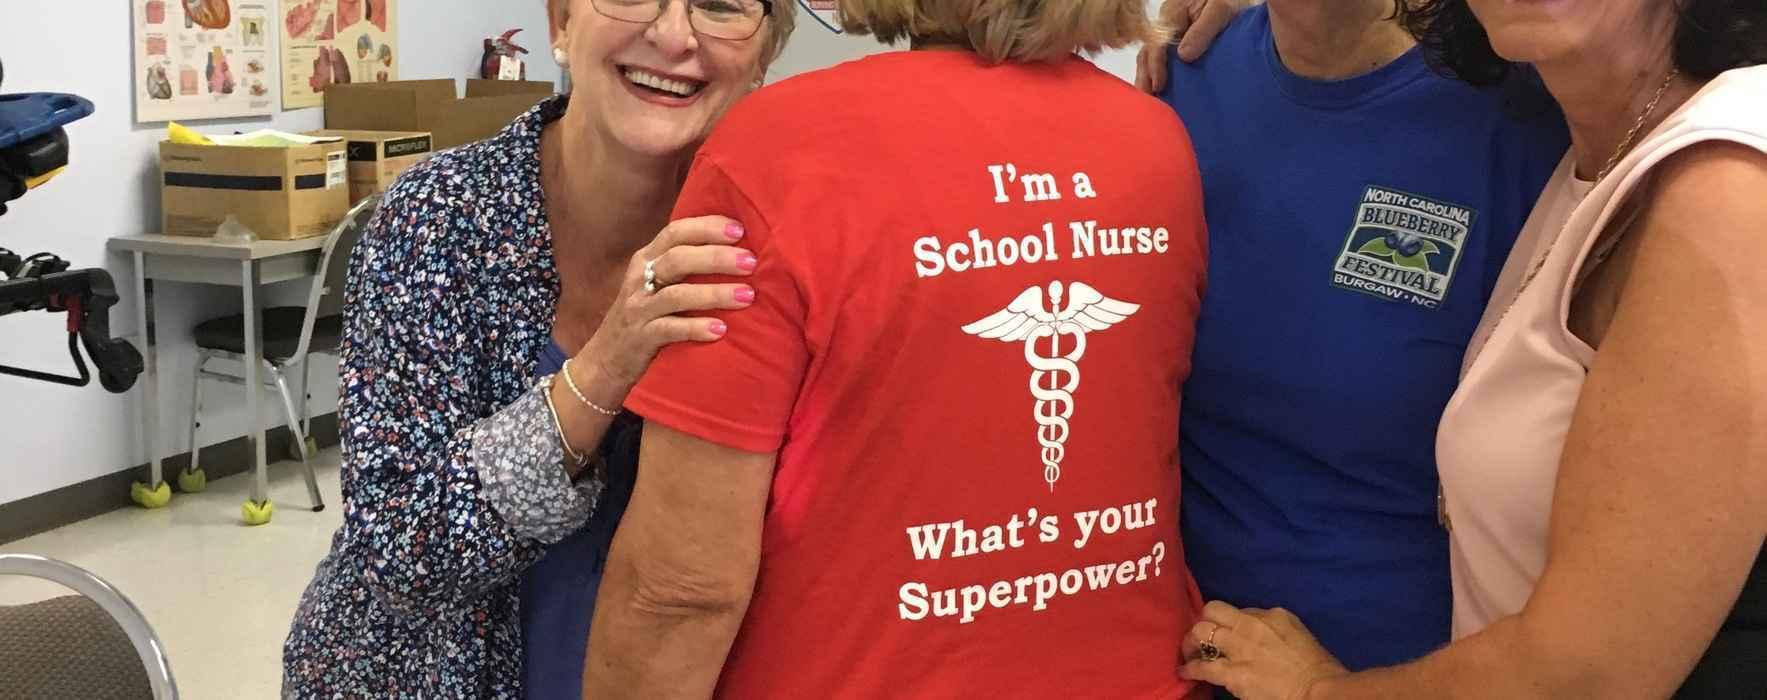 Superhero School Nurses work hard to keep kids healthy! image